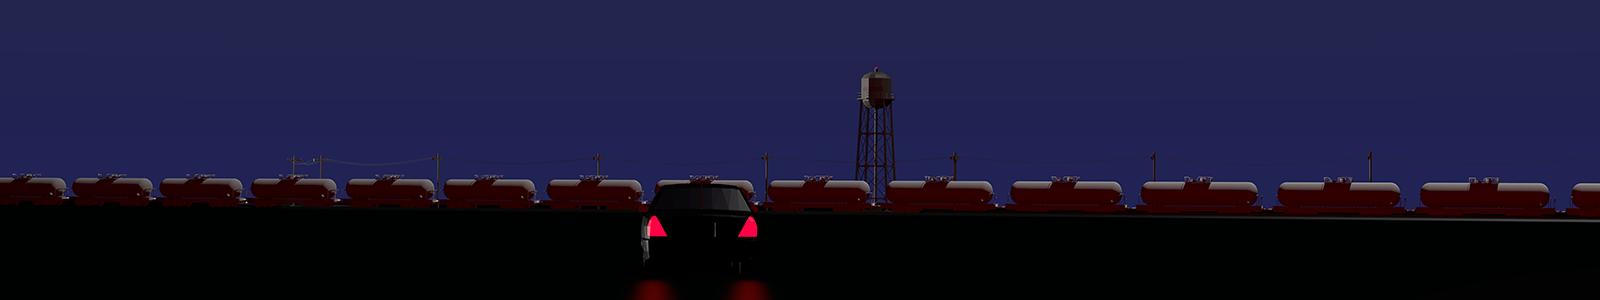 Trommer-train-landscape